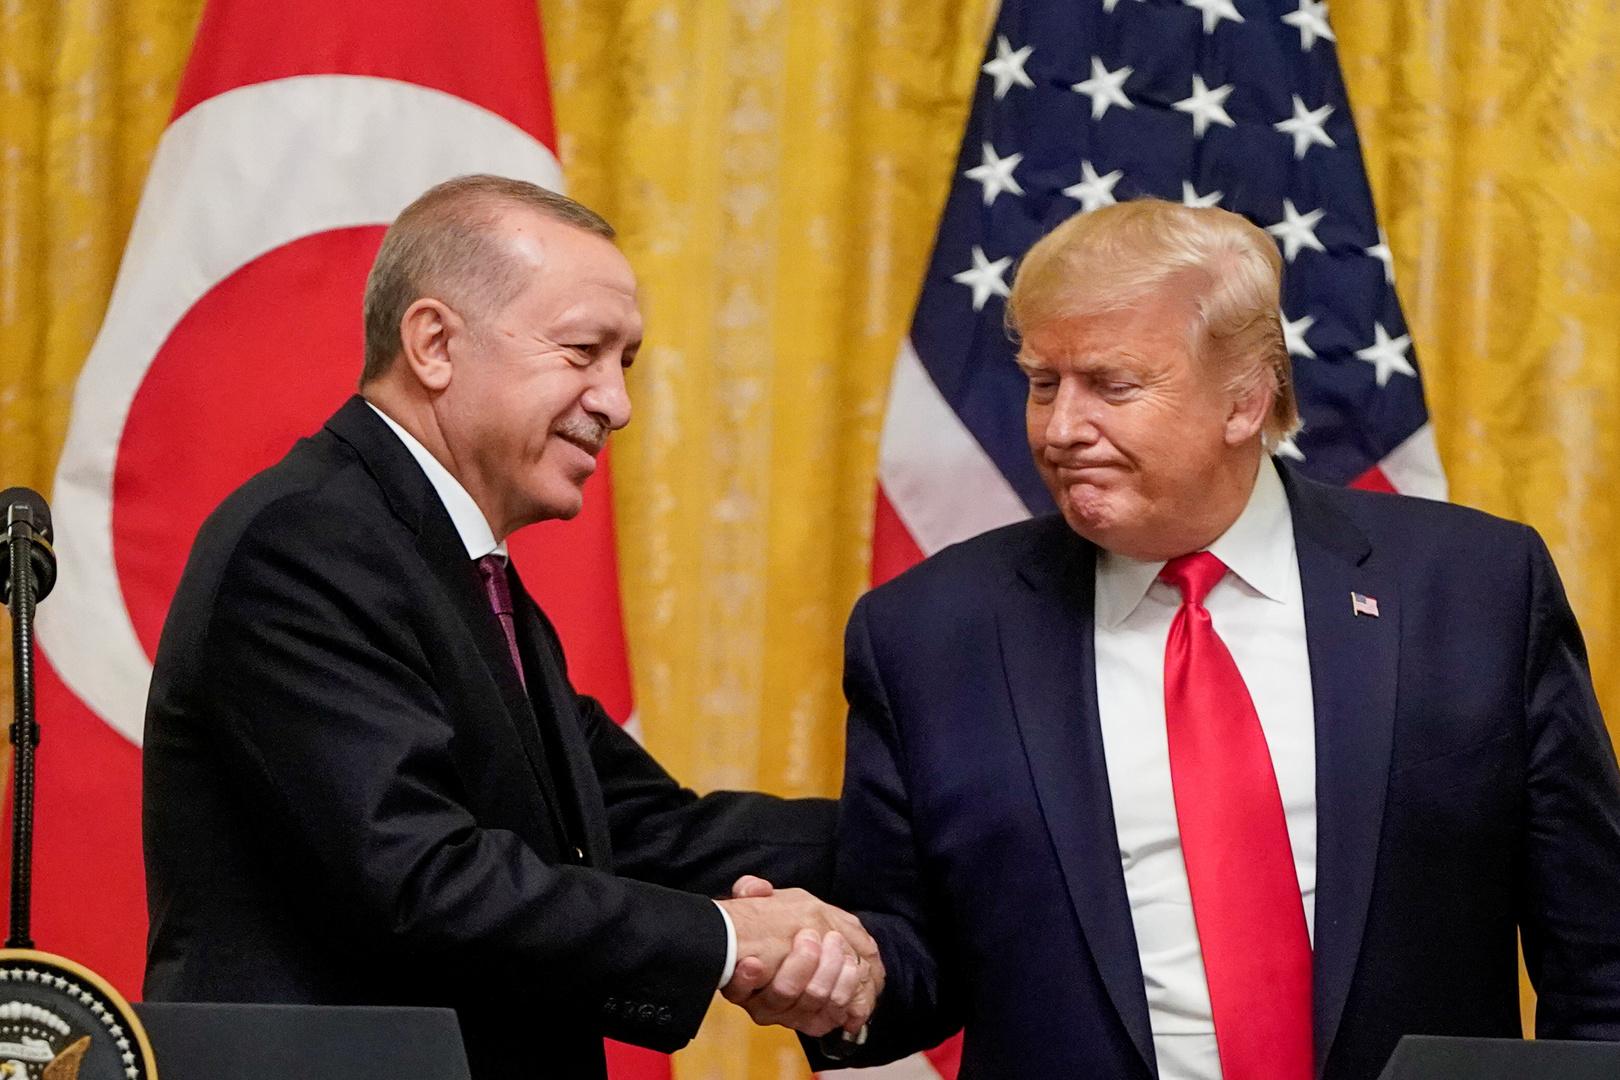 أردوغان وترامب يتفقان حول مصير معتقلي